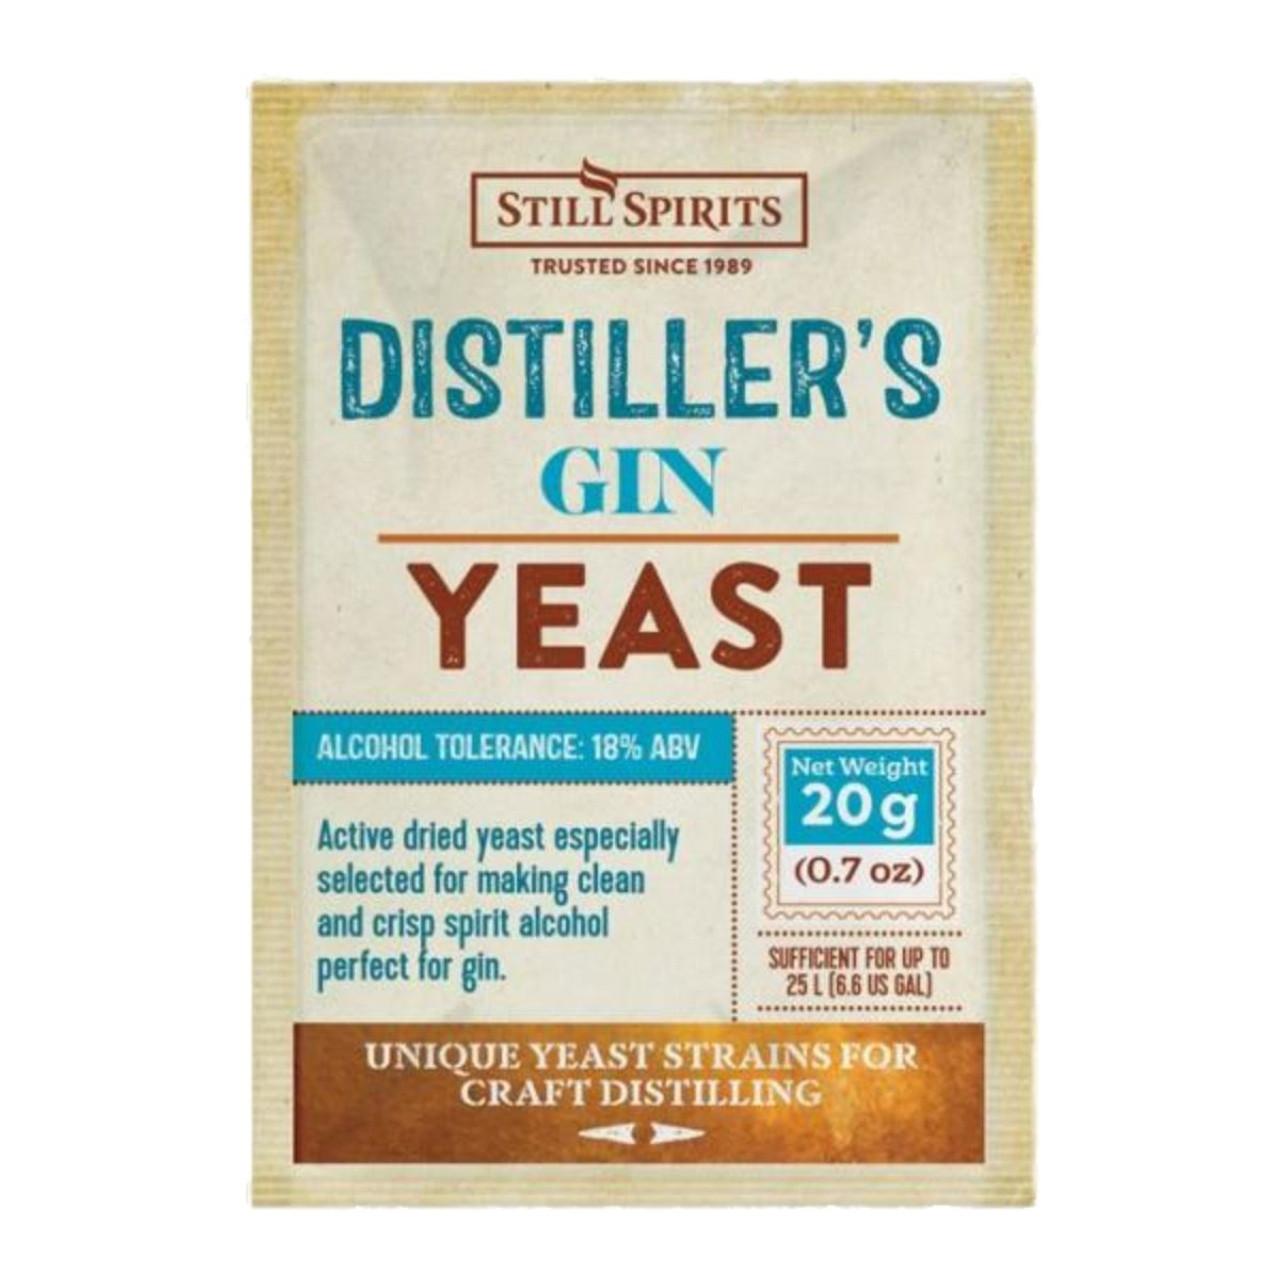 Still Spirits Distillers Gin Yeast 20g for 25L 18% ABV Maximises Botanicals